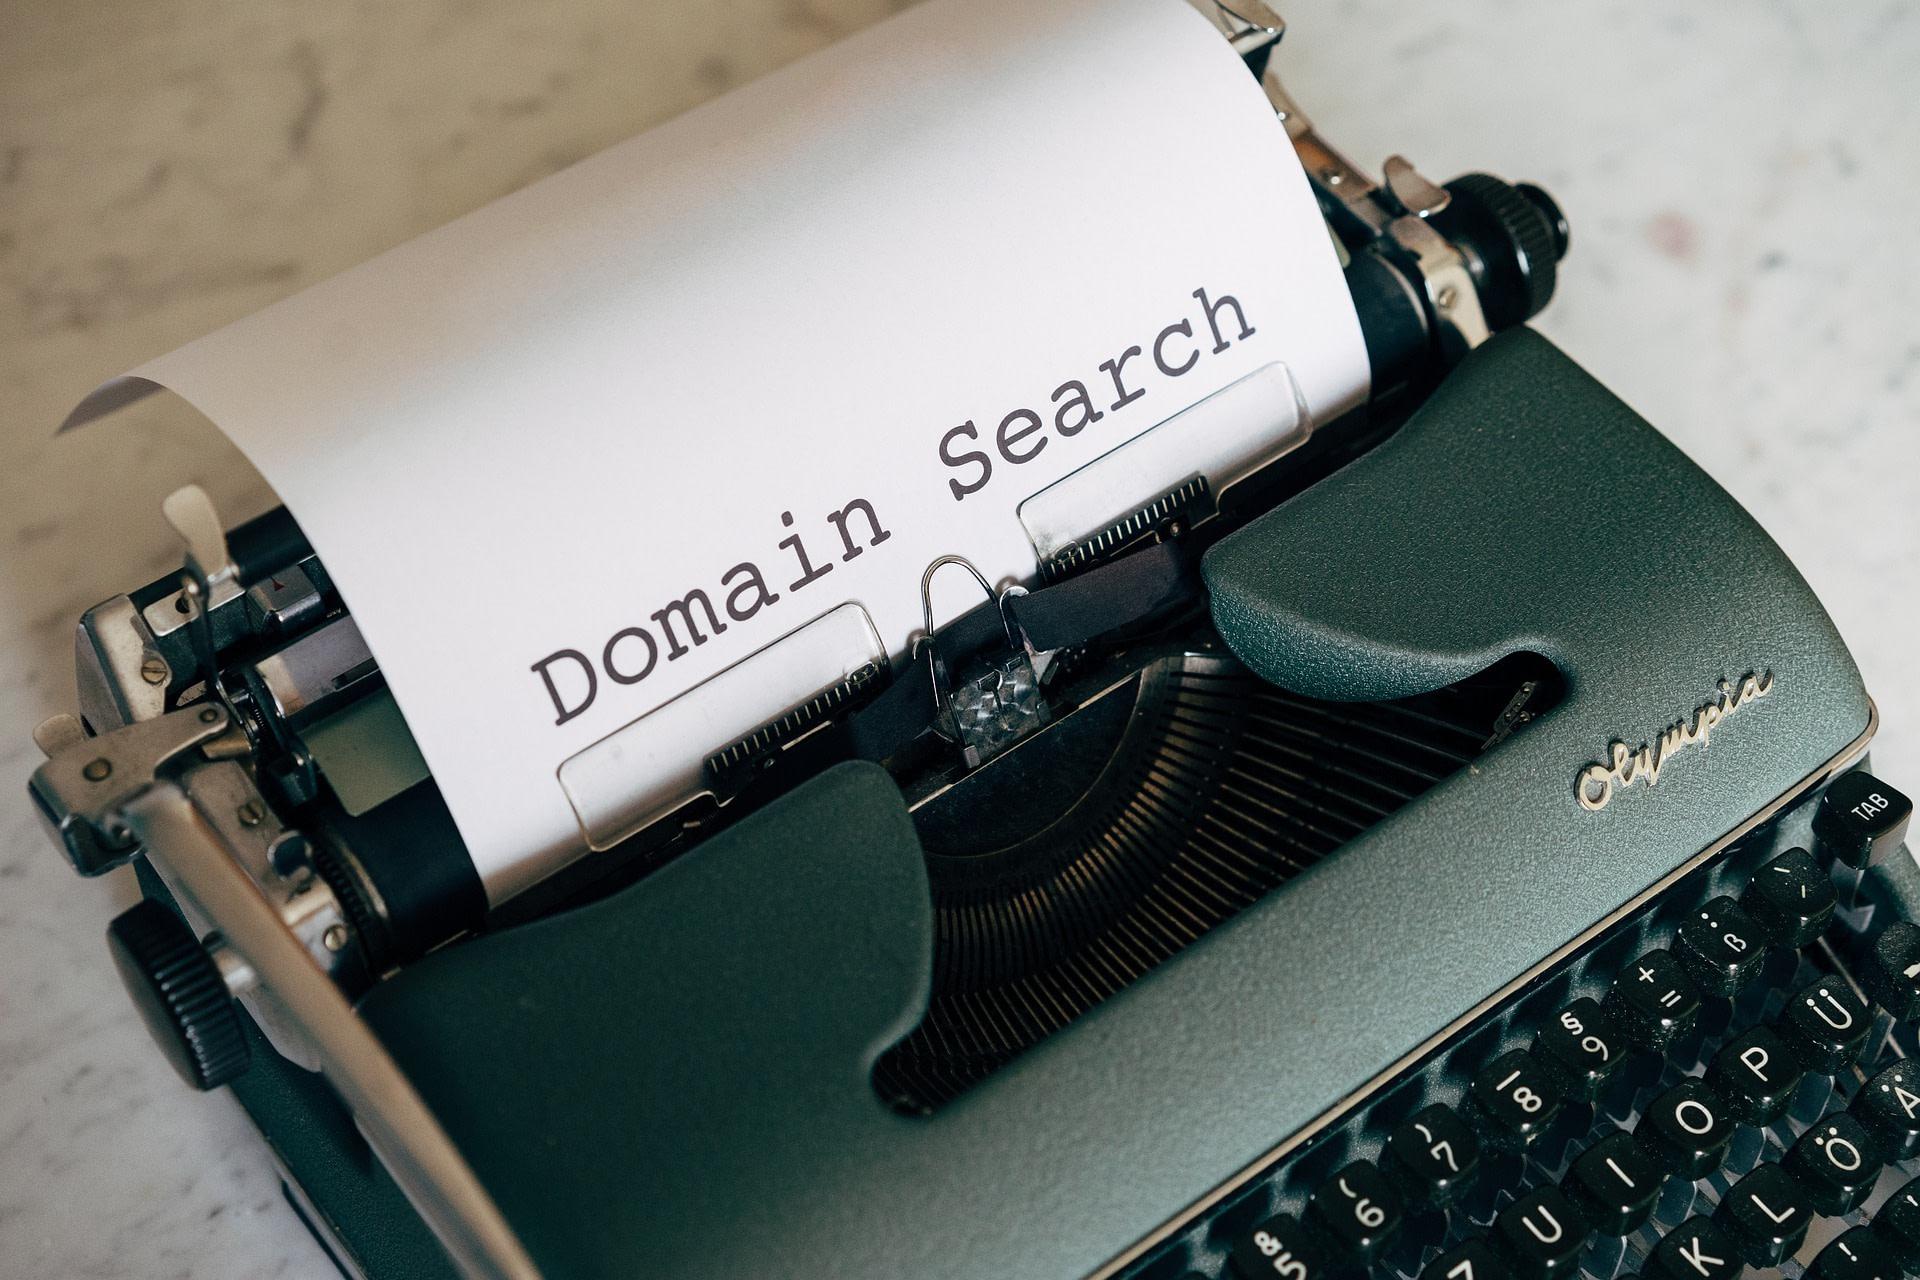 personal academic website domain name